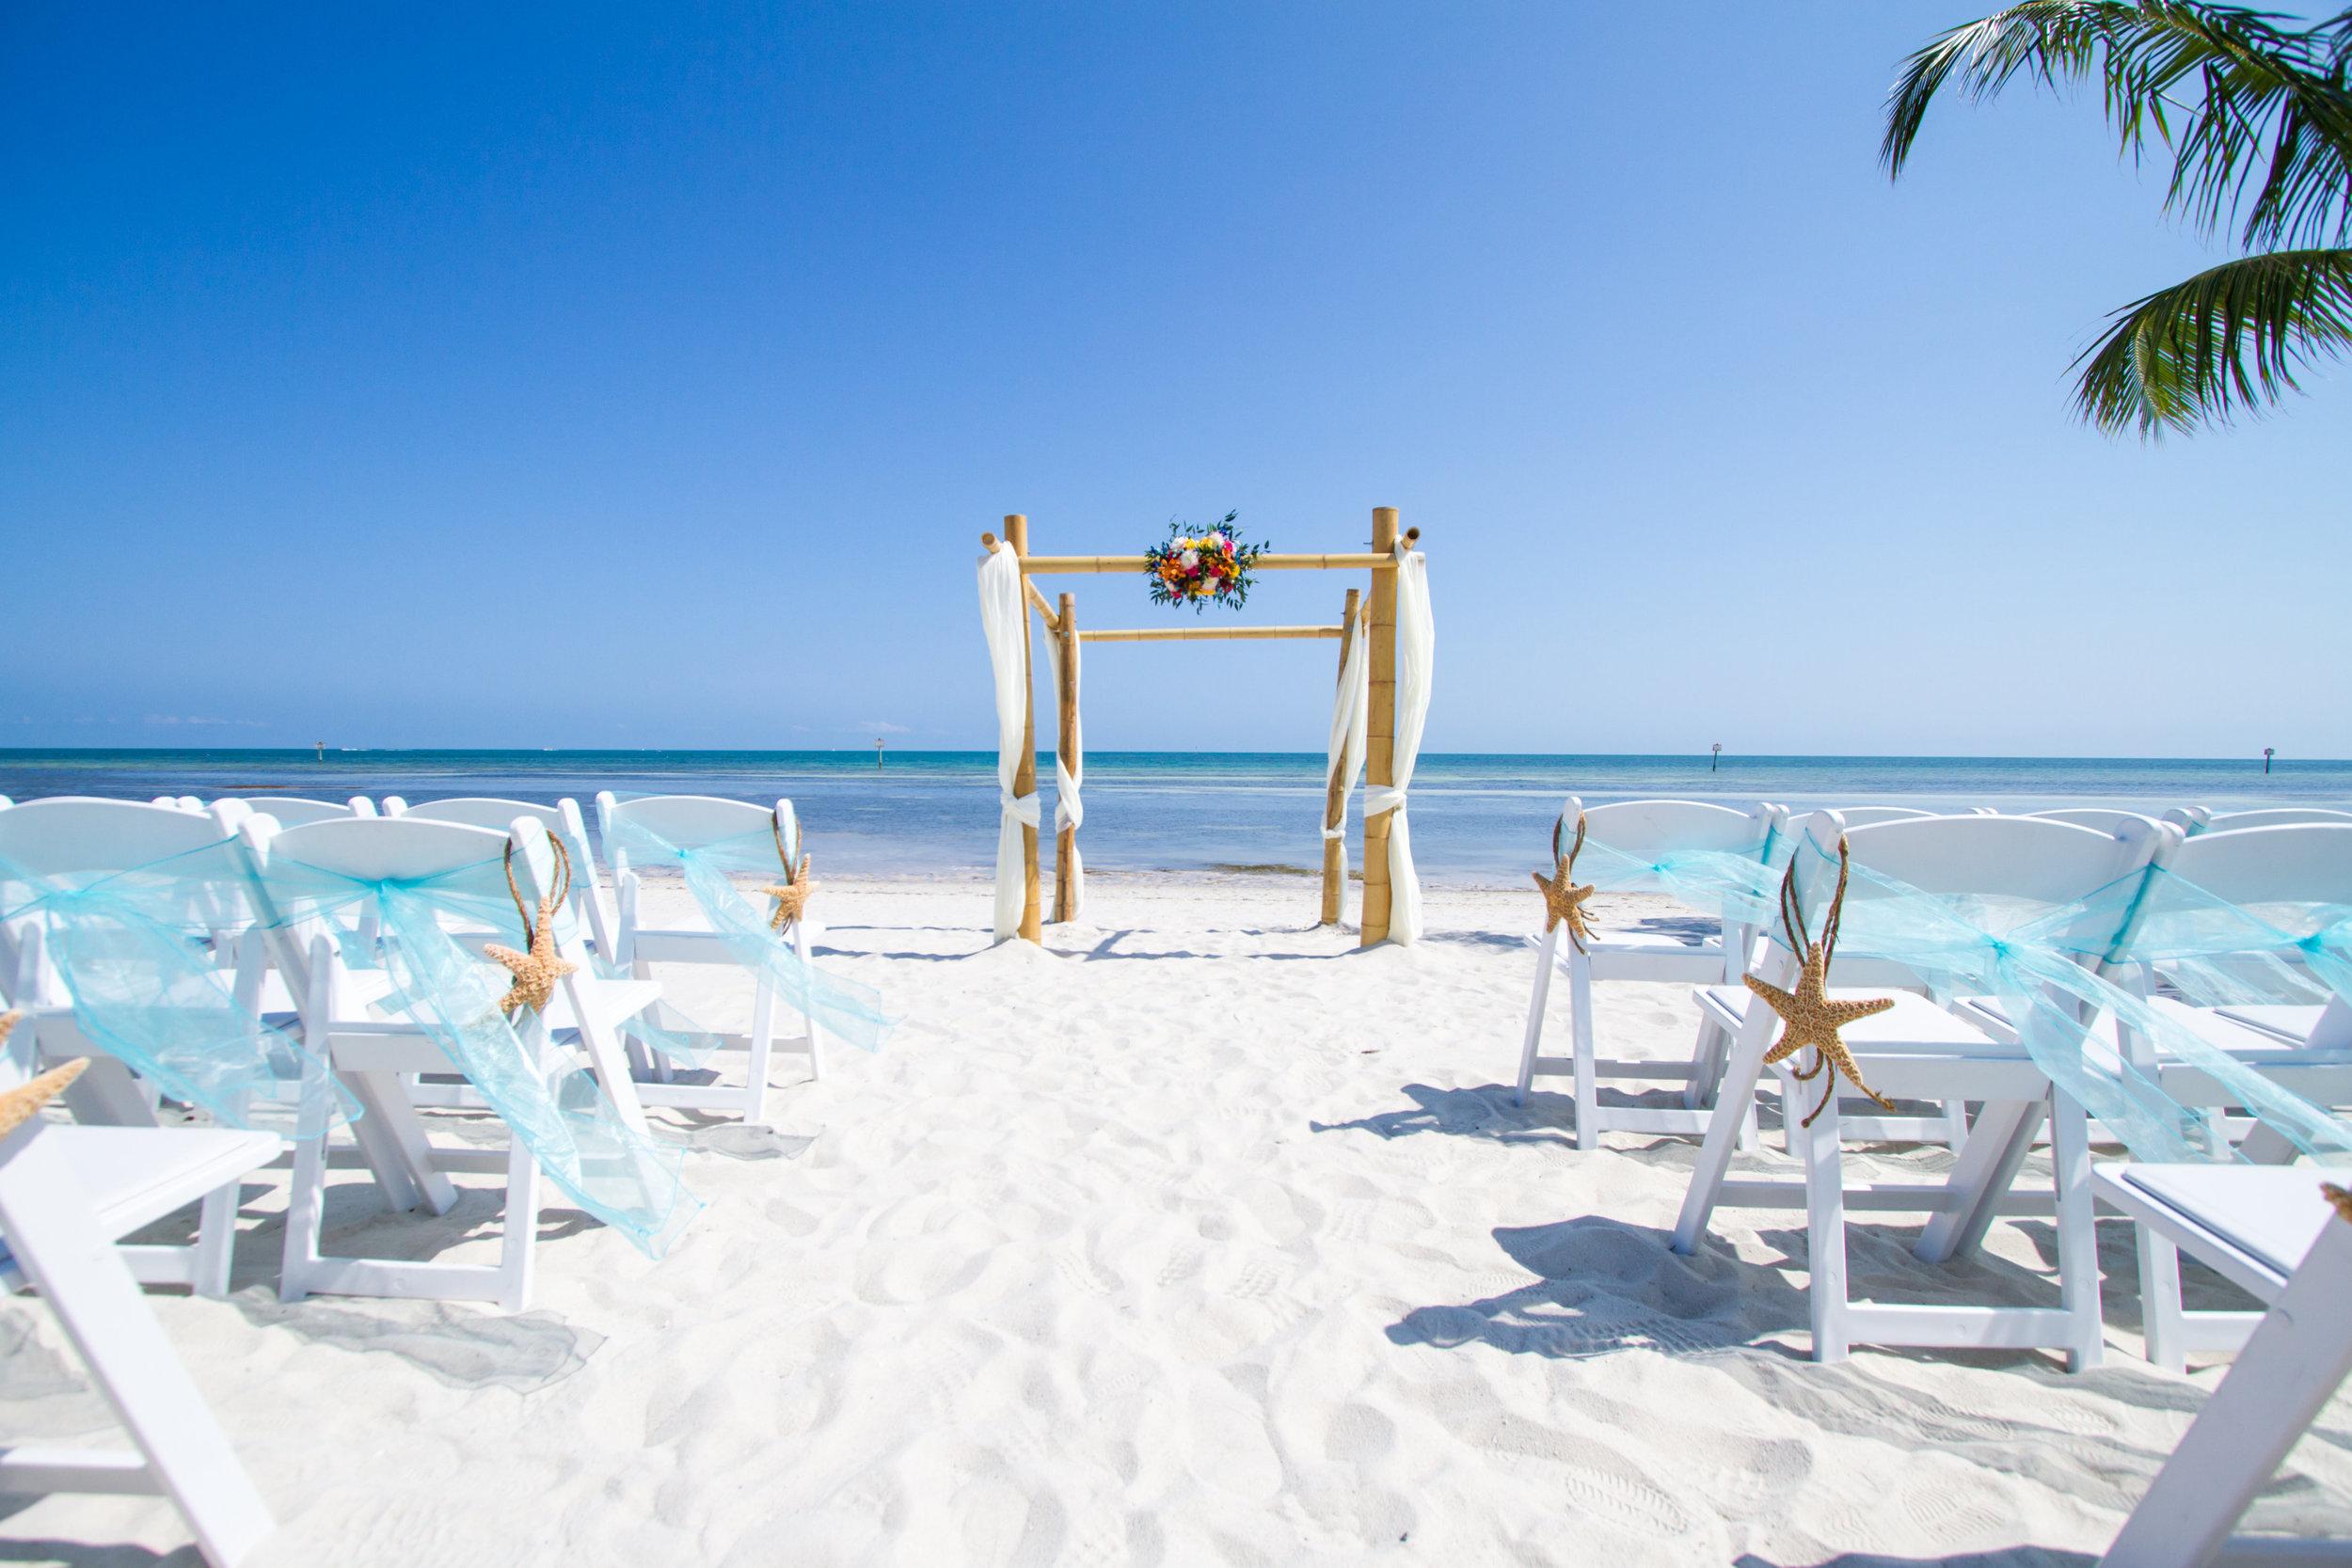 Ashley-Cory-Wedding-Key-West-3-Ceremony-0001.jpg